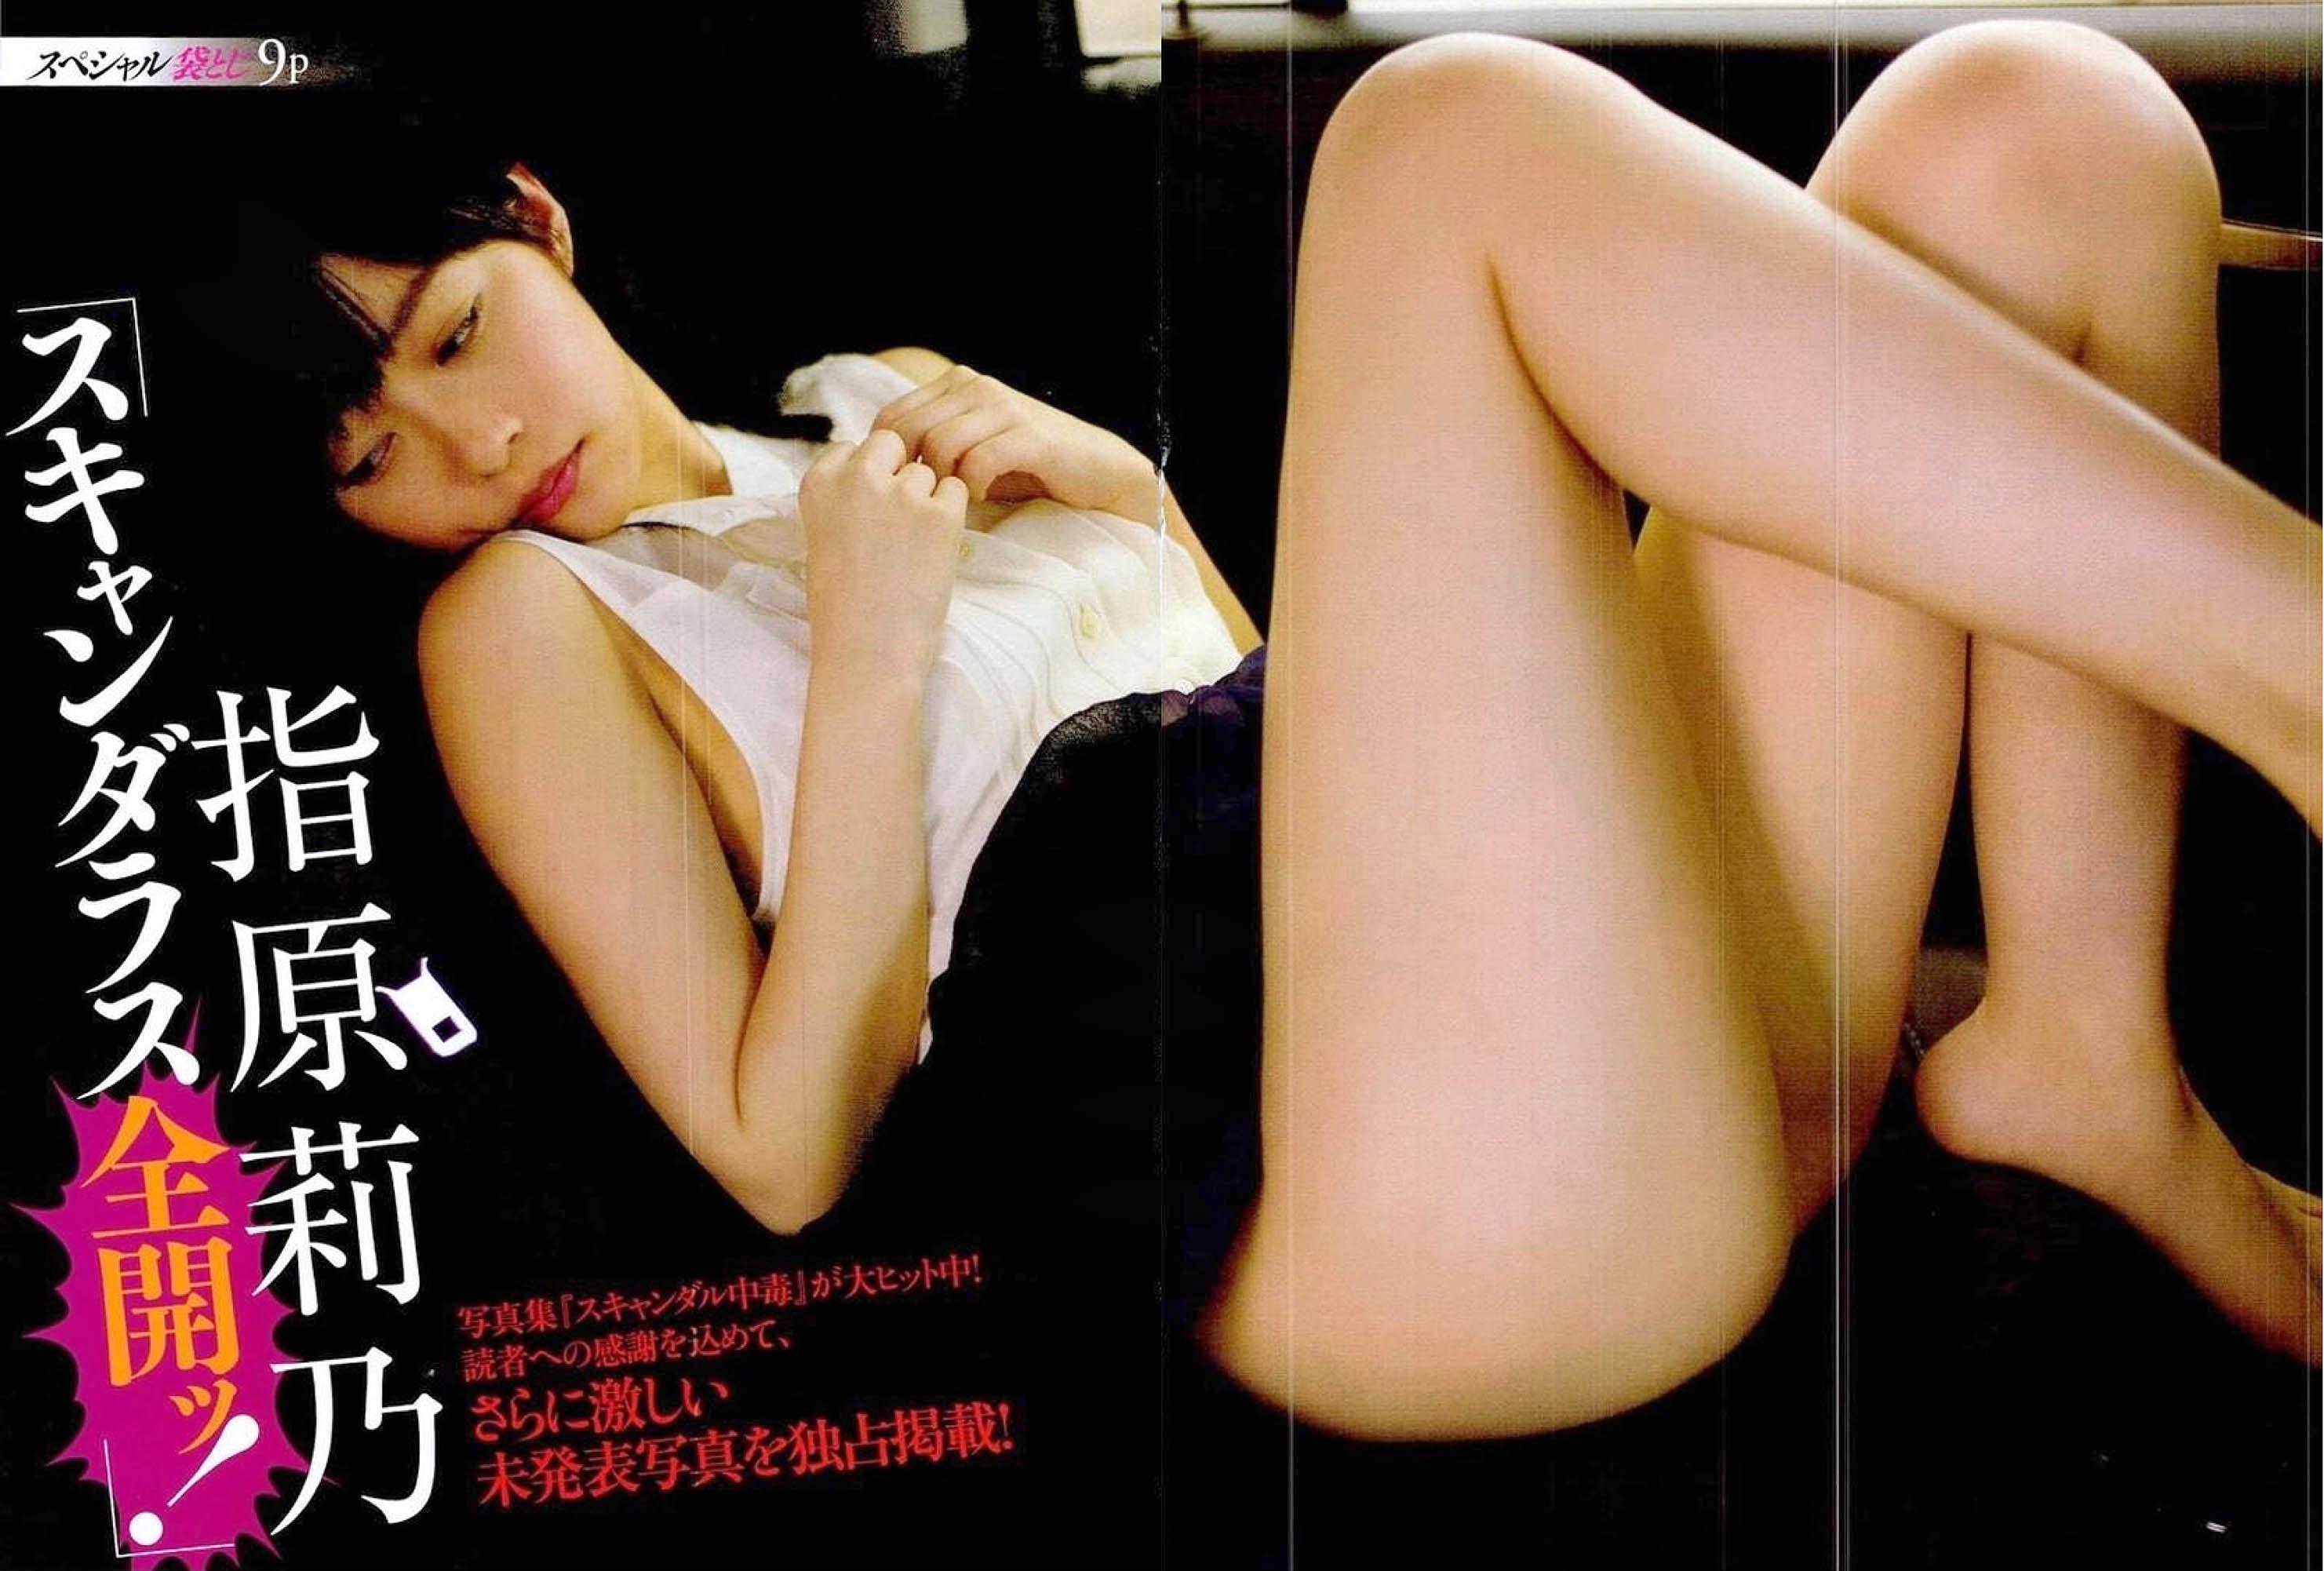 RSashihara Friday 160429 08.jpg